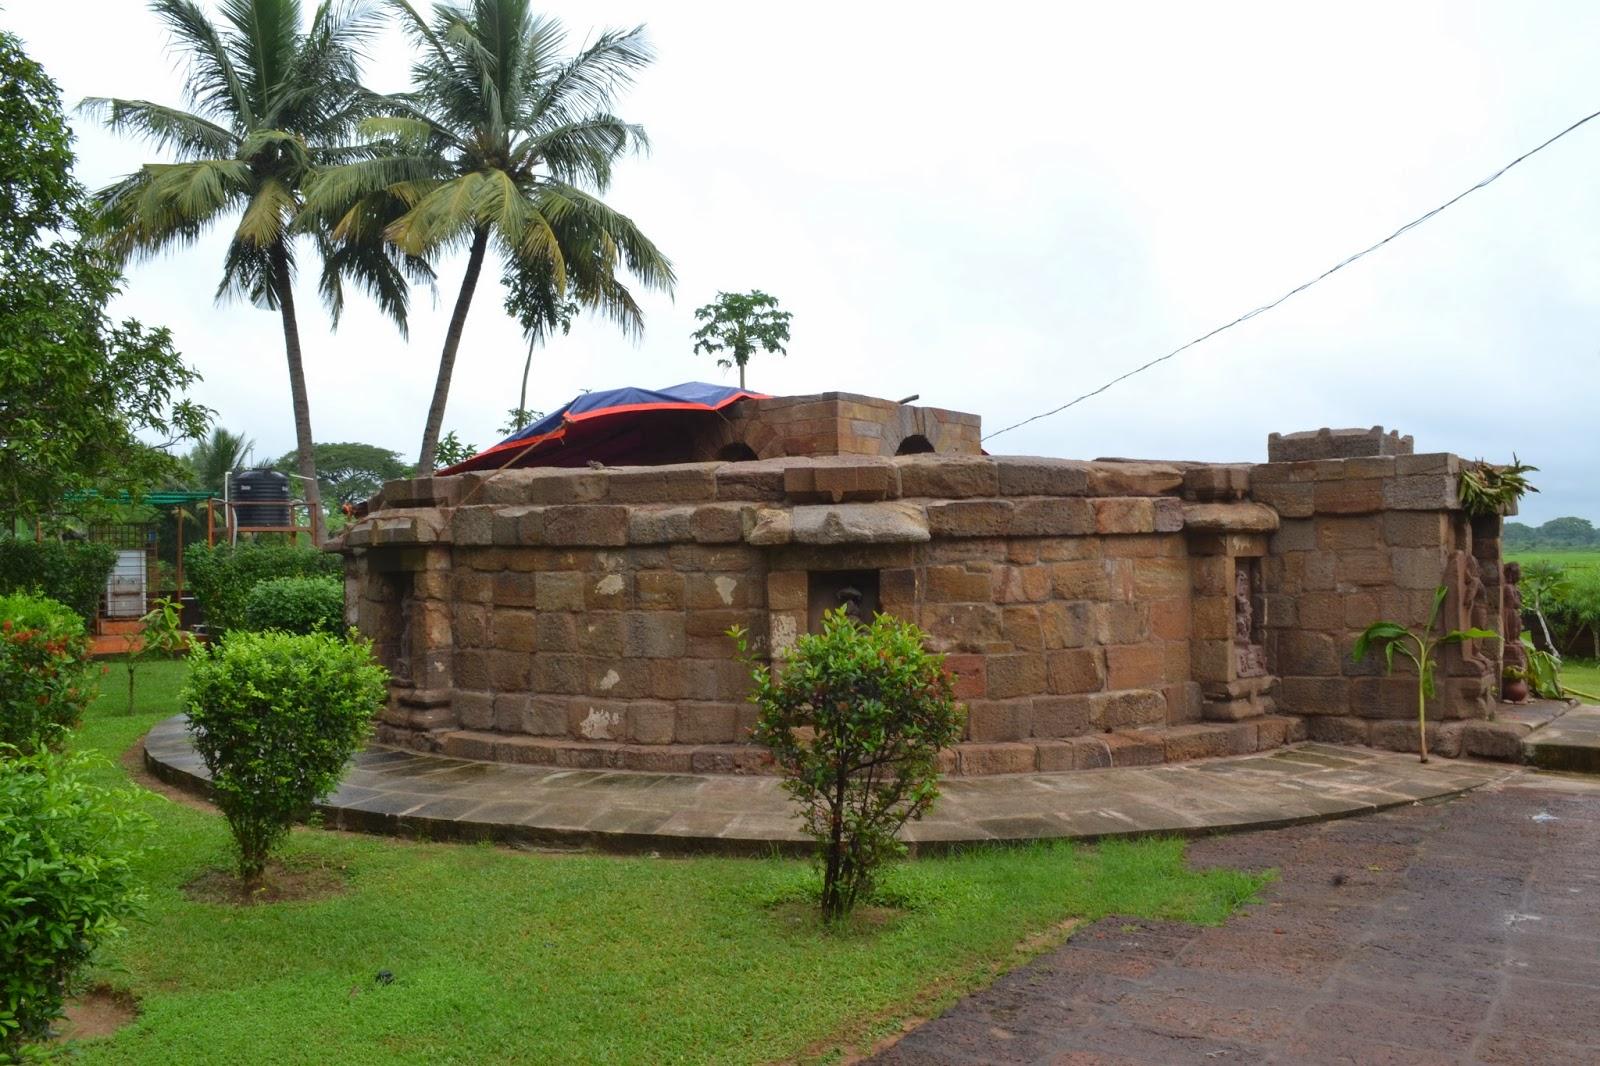 64 yogini ( chausath yogini) temple